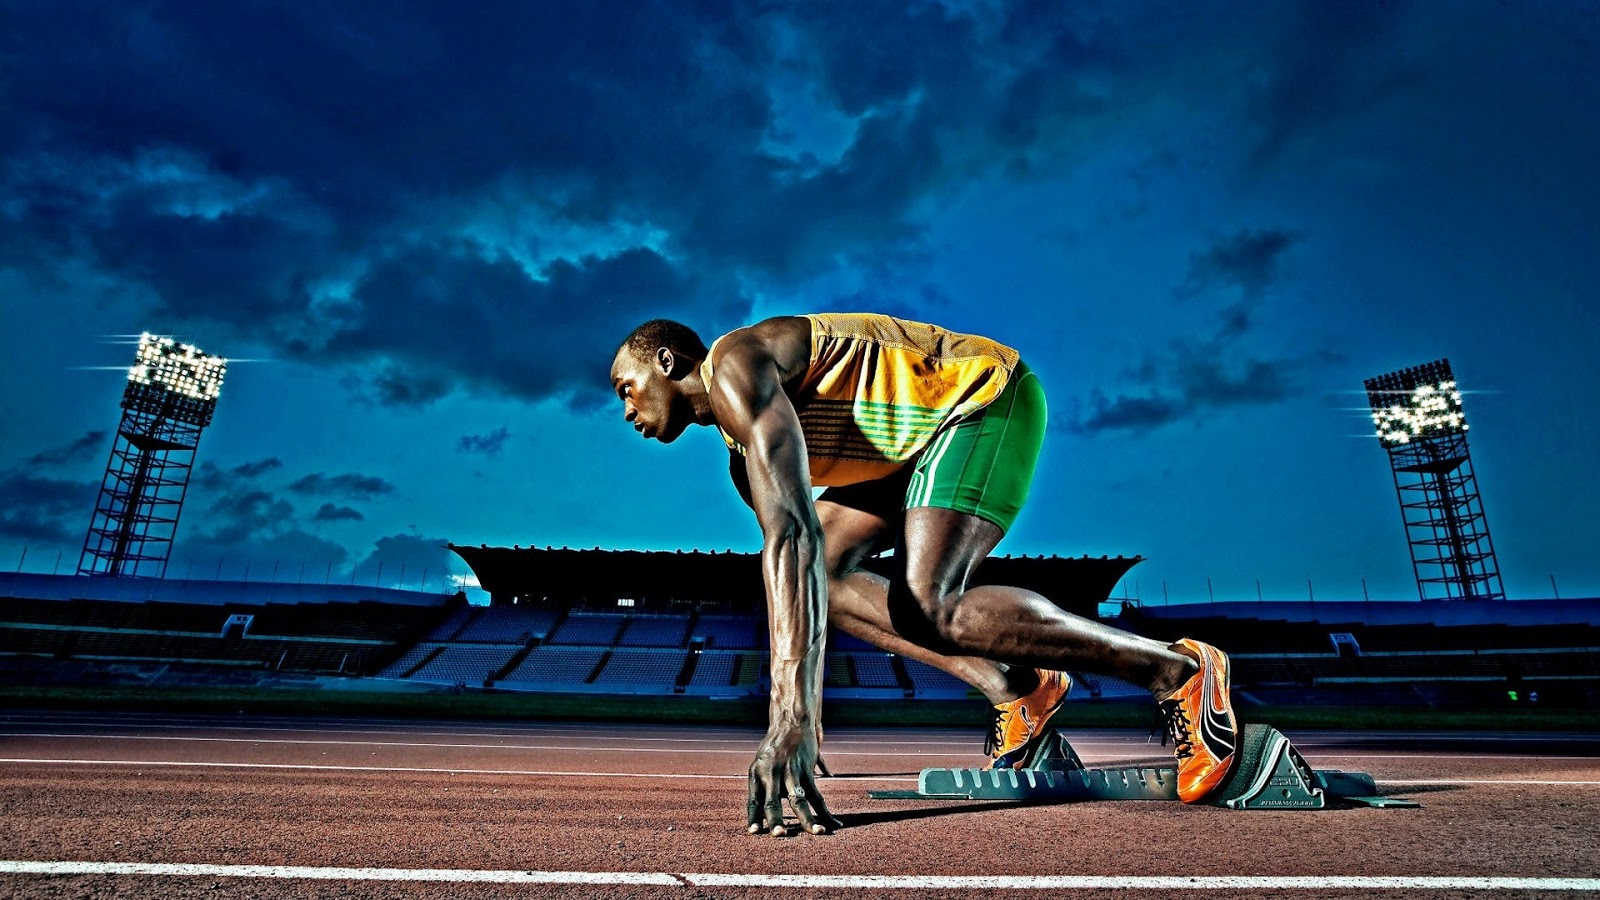 download wallpaper black sports - photo #24